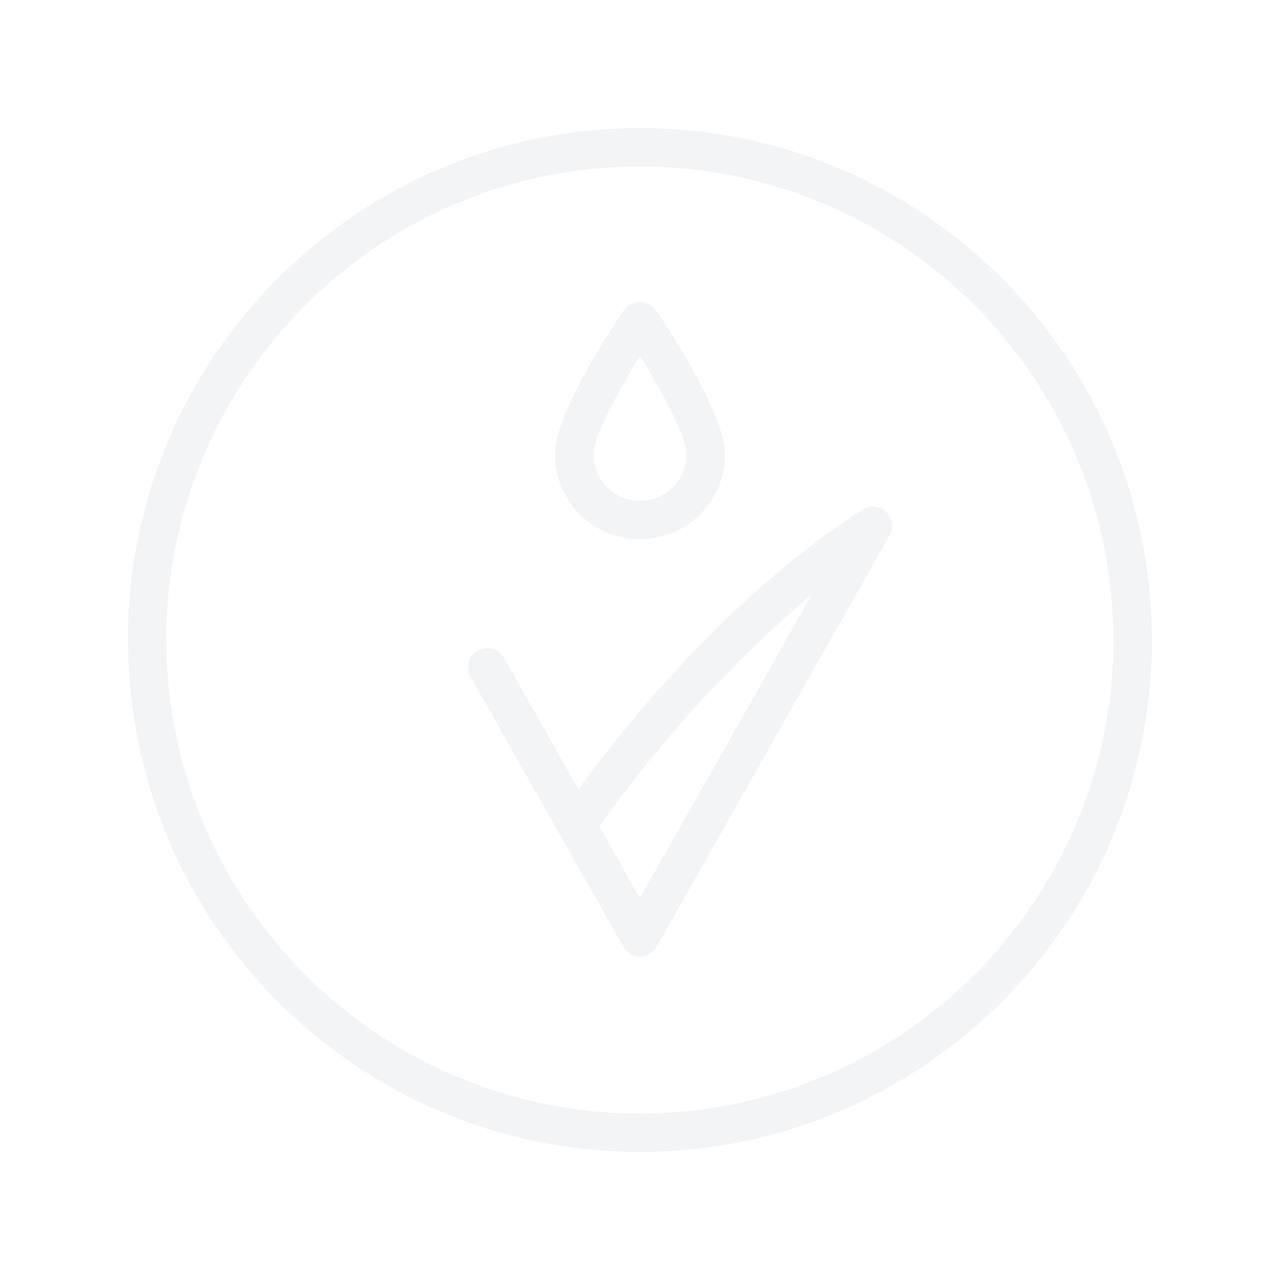 BIOSILK Silk Therapy Natural Hold Finishing Spray 284g